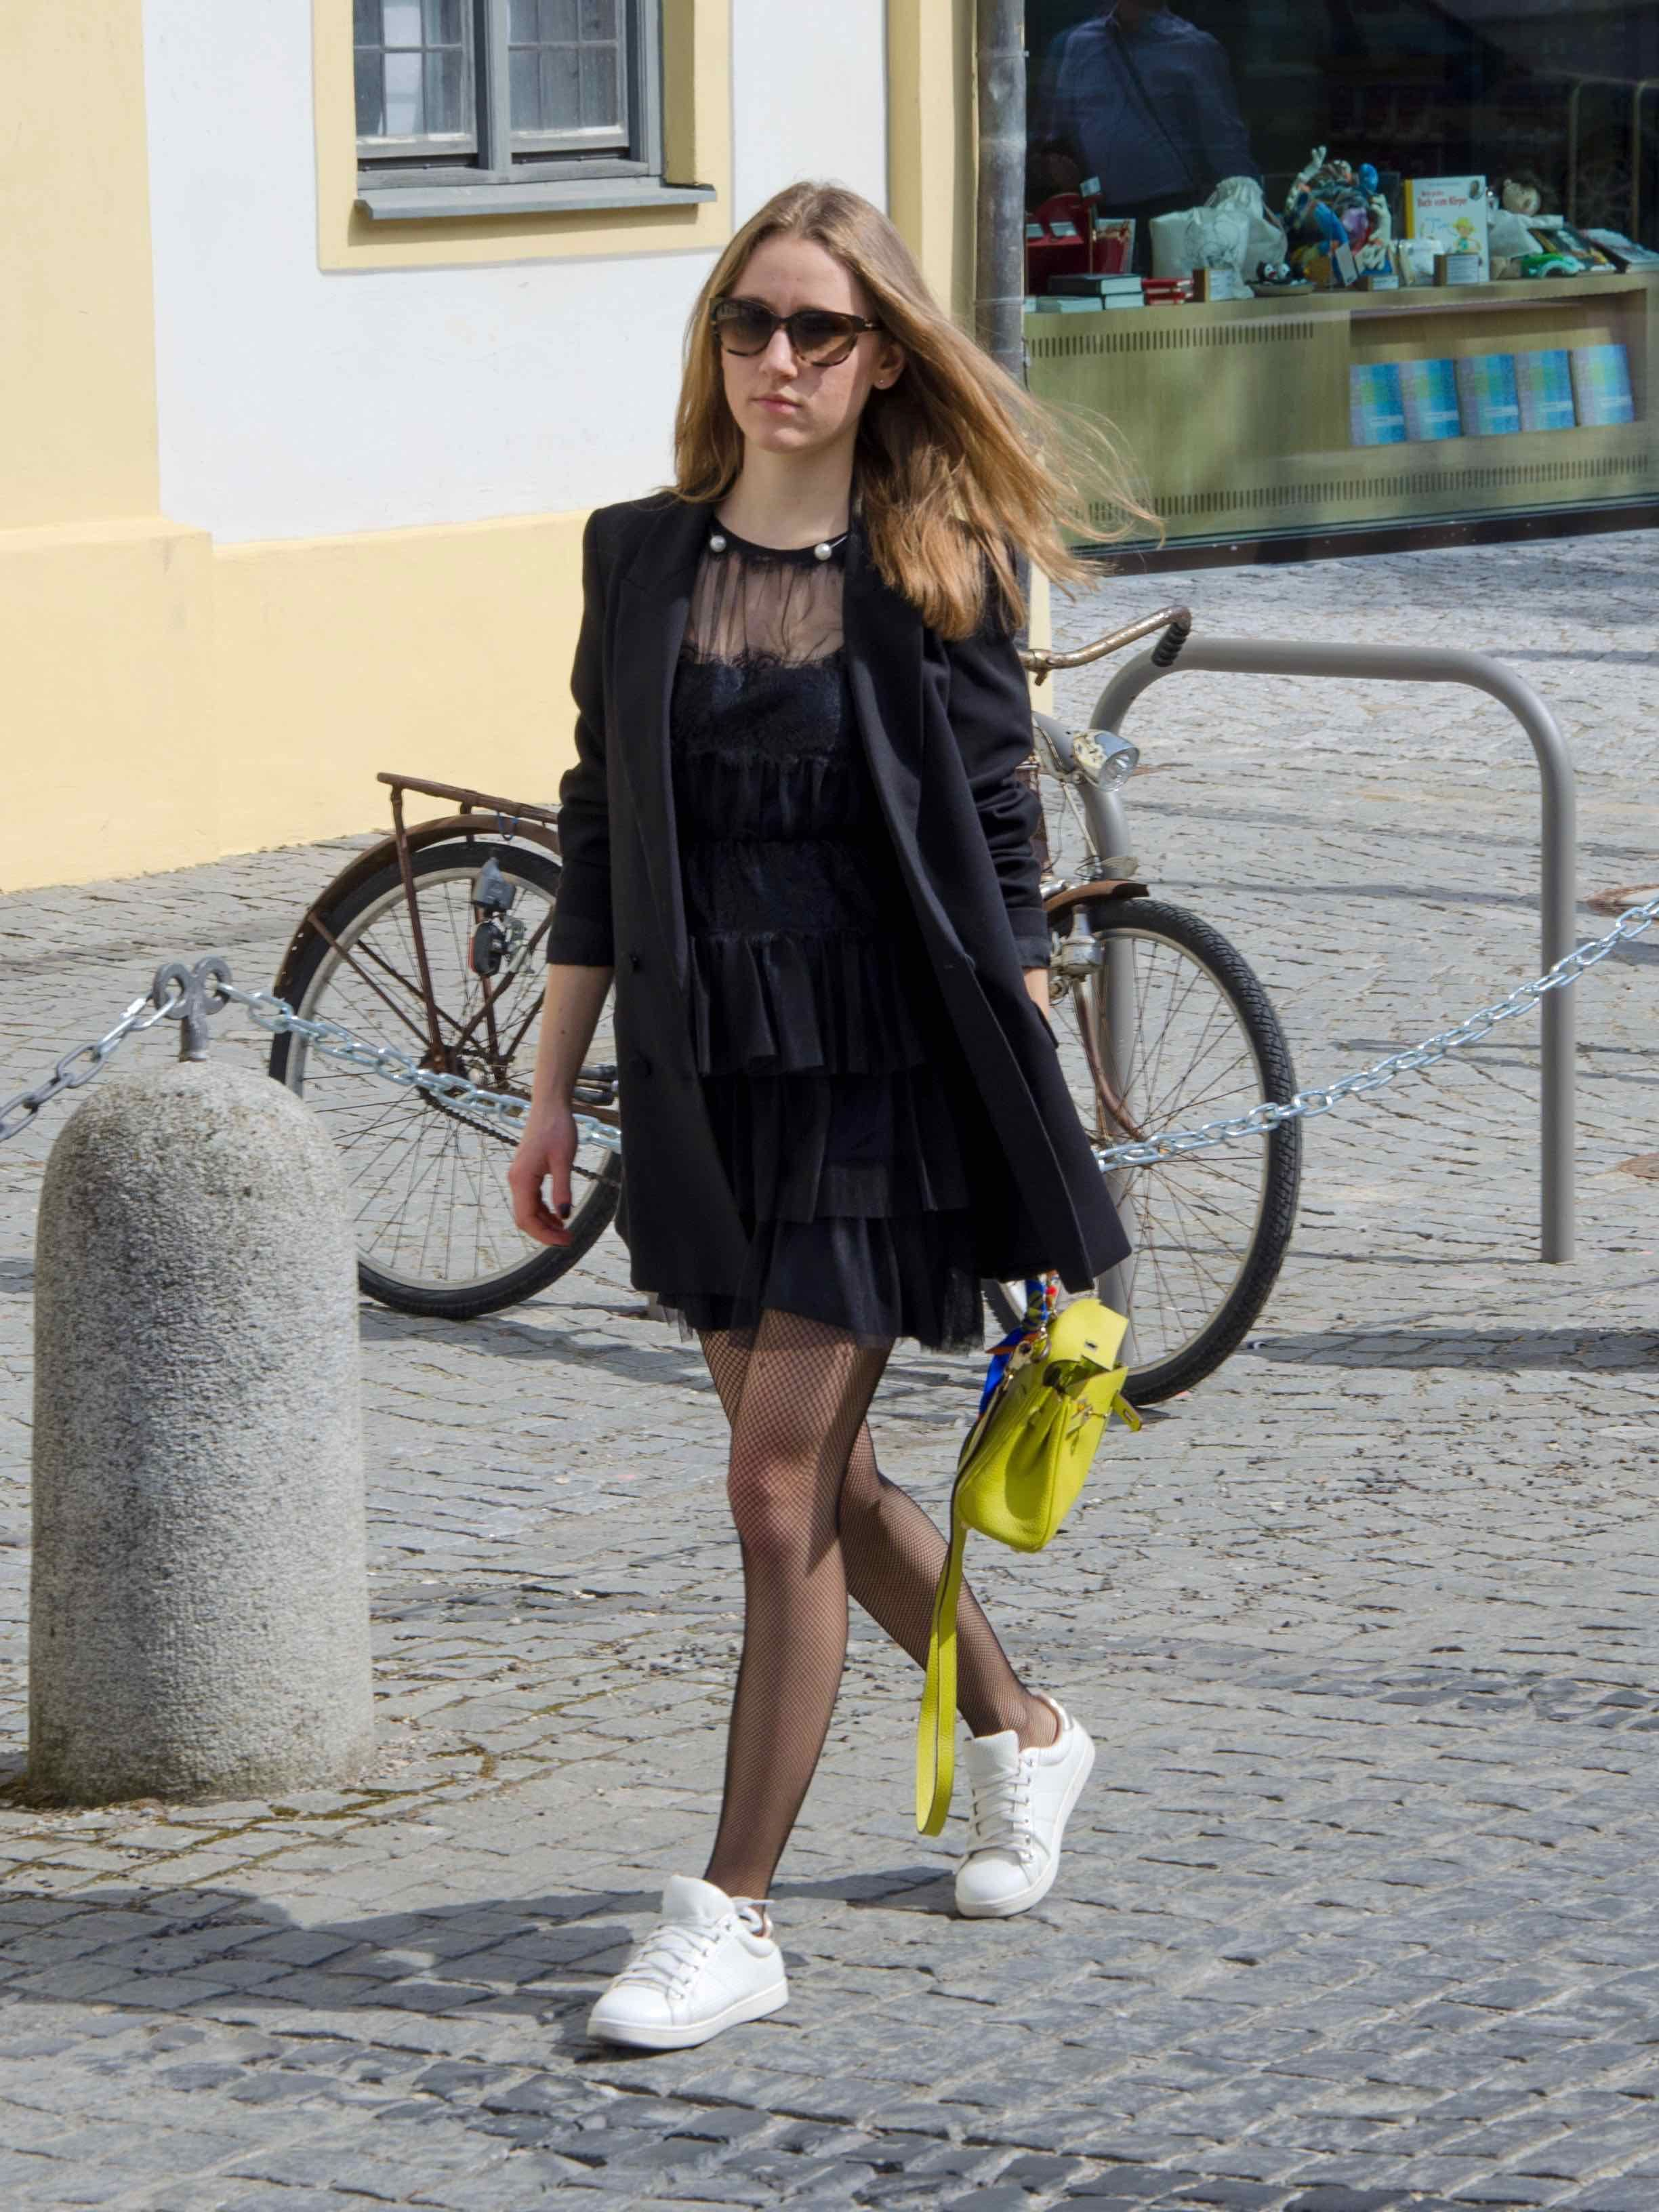 Black layered tull dress, fishnet stockings and white sneakers - Petiite  Noir